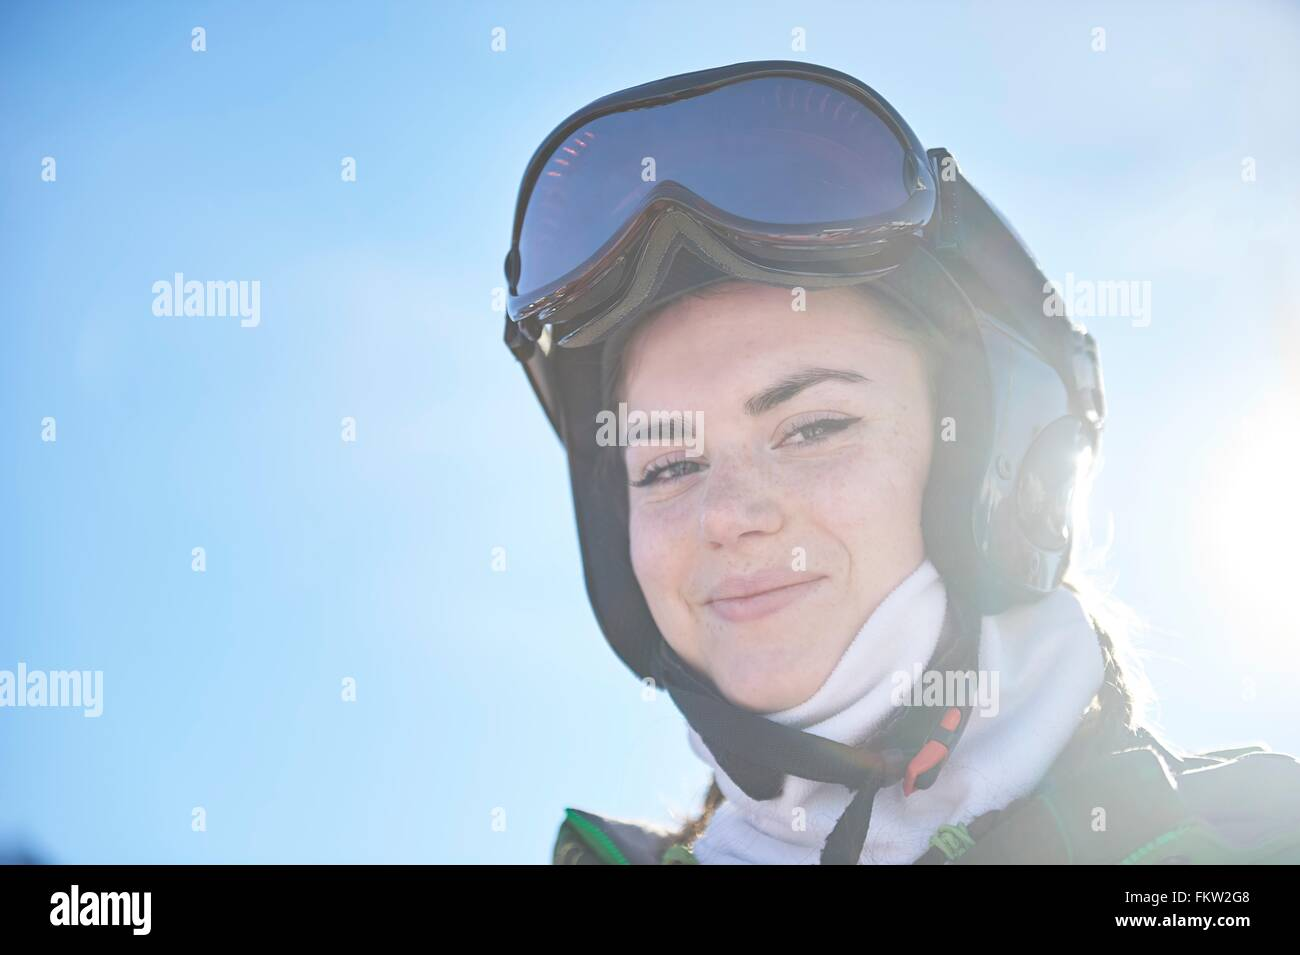 Girl on skiing holiday - Stock Image